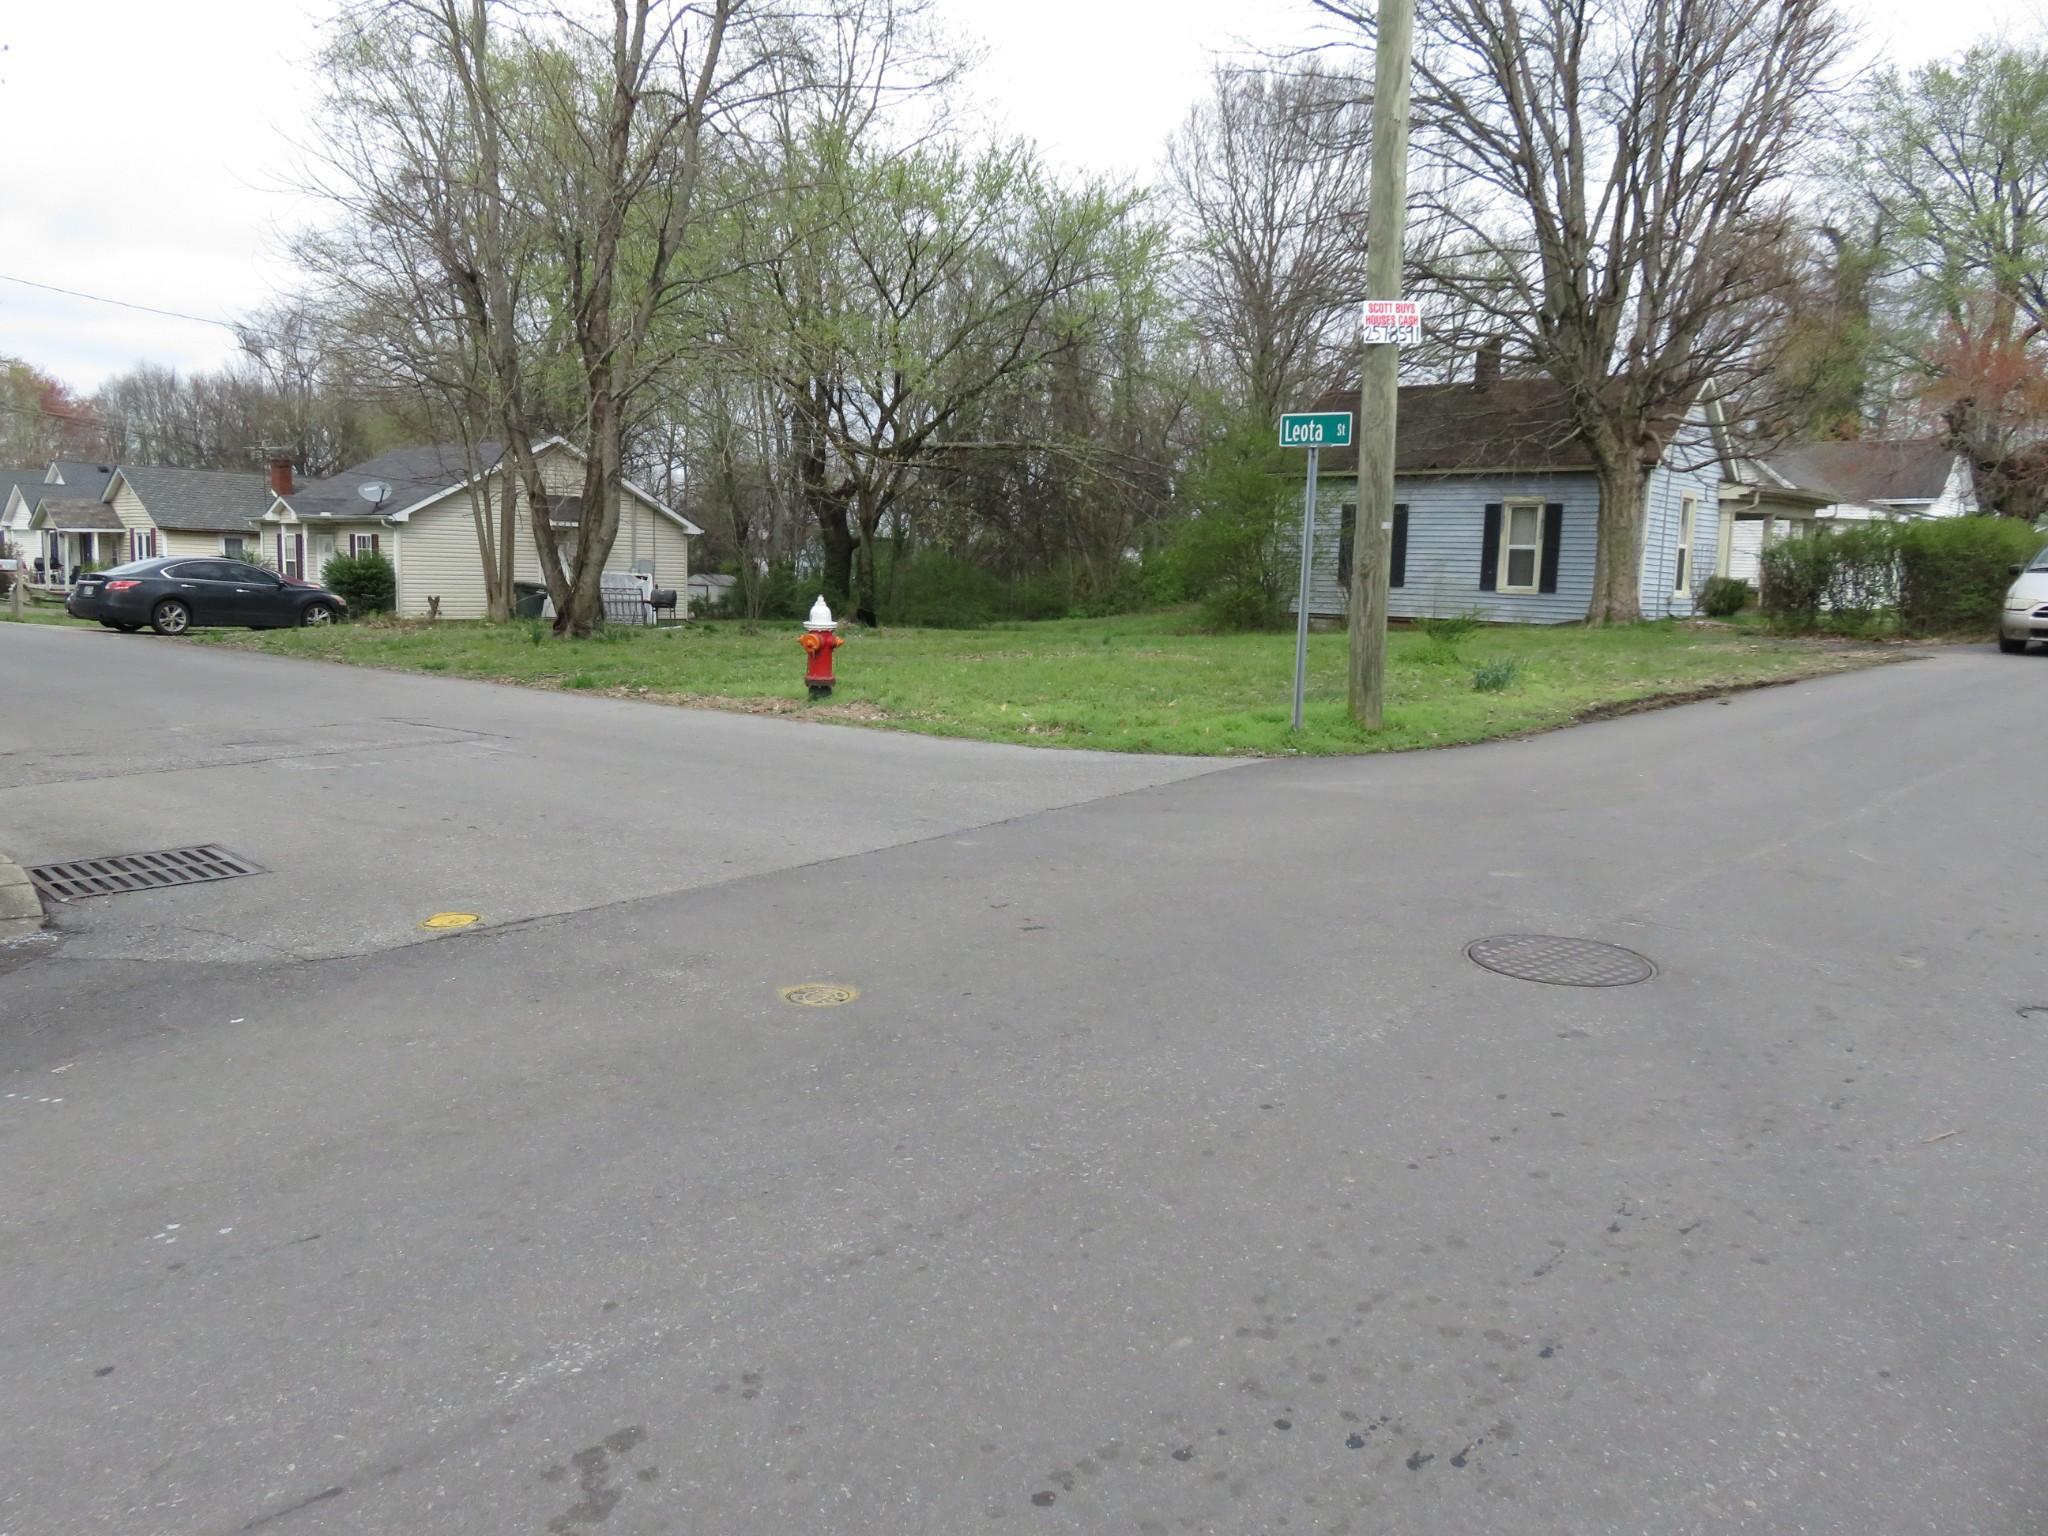 209 17th Ave, W, Springfield, TN 37172 - Springfield, TN real estate listing